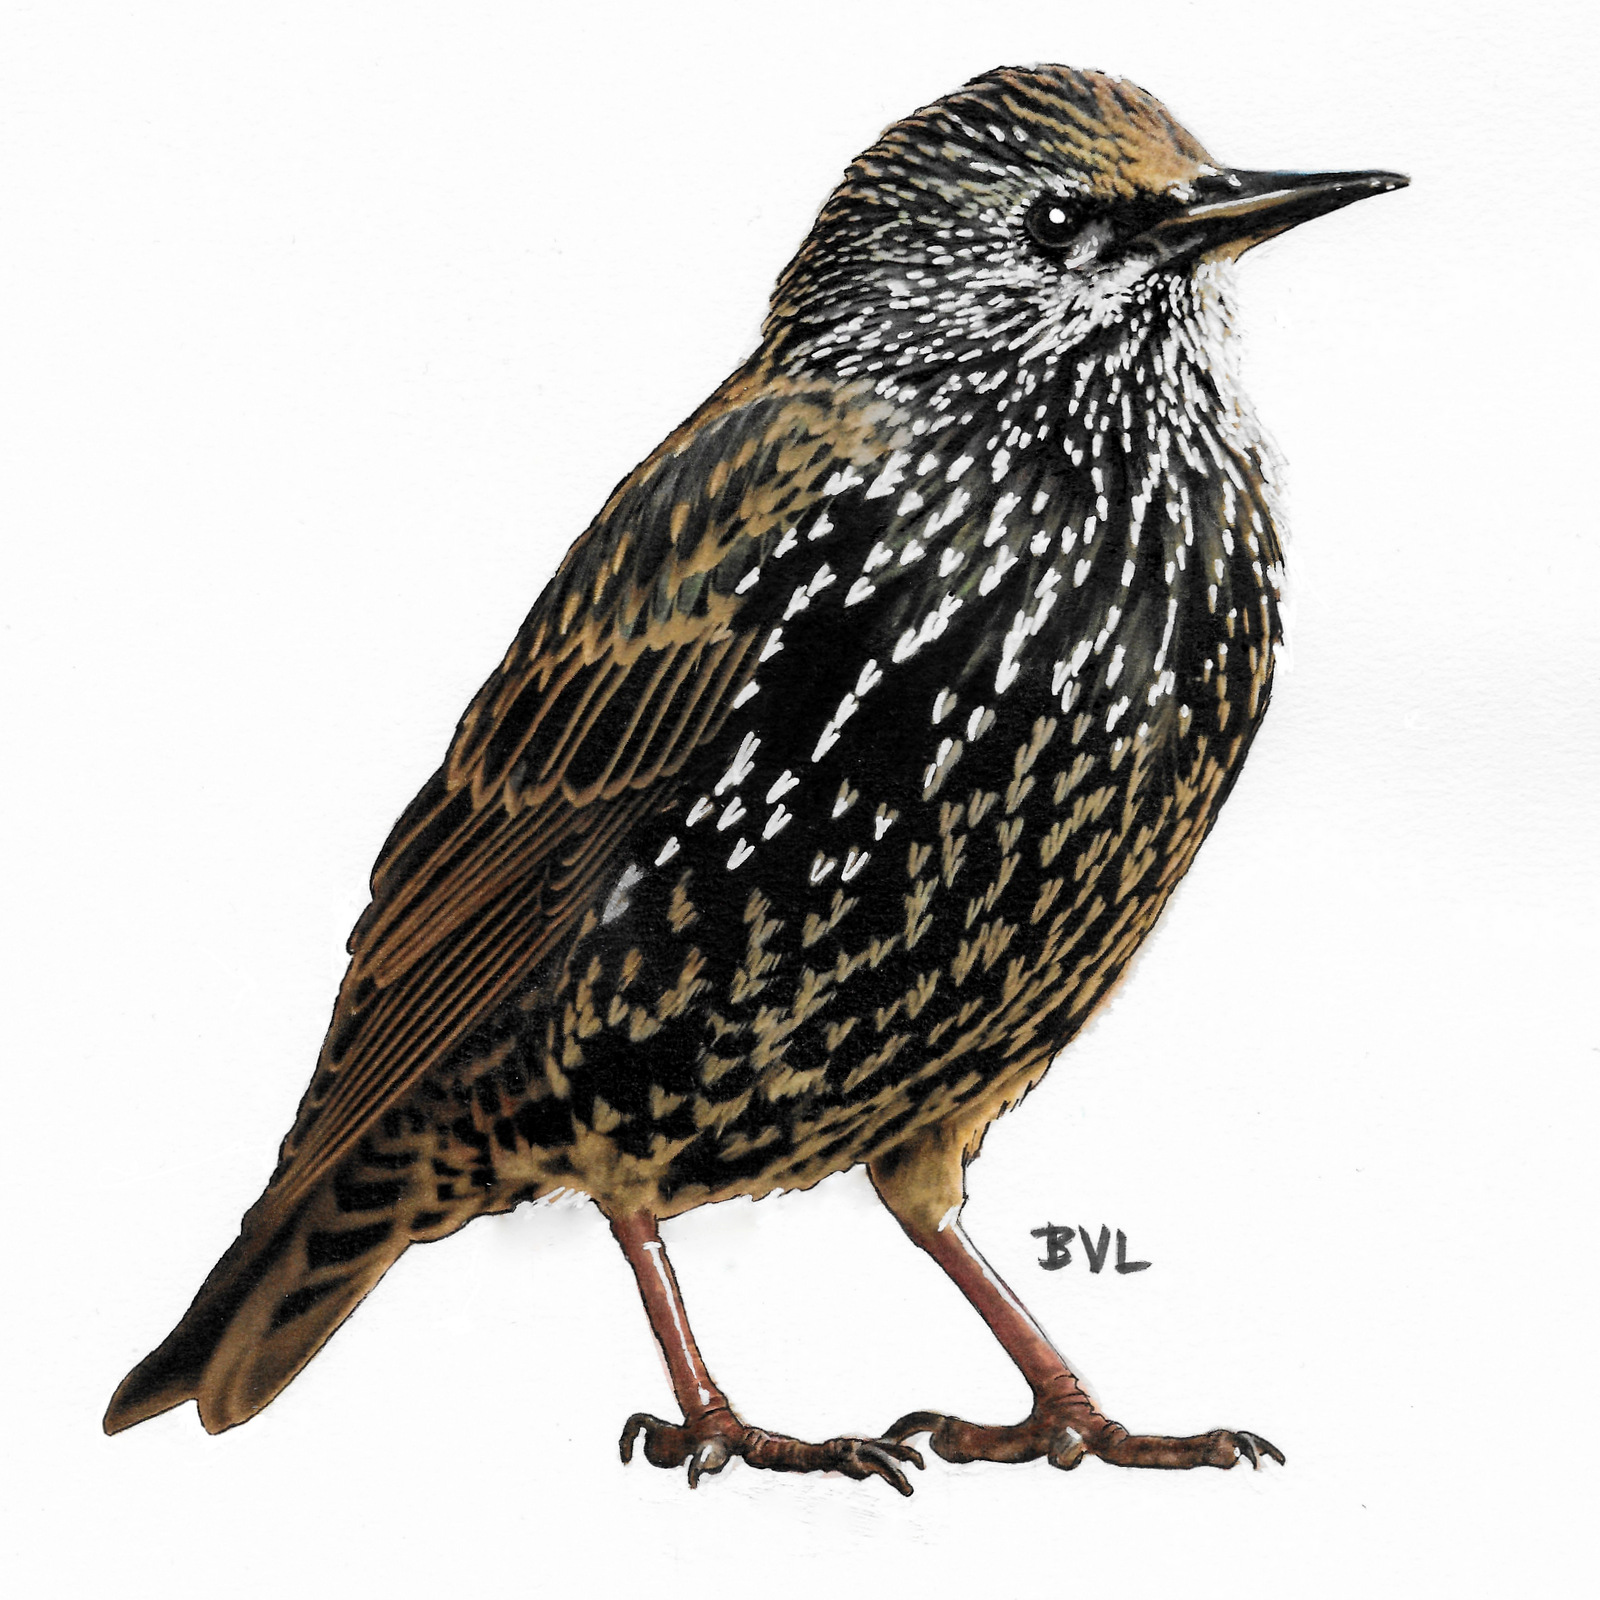 Spreeuw, Starling